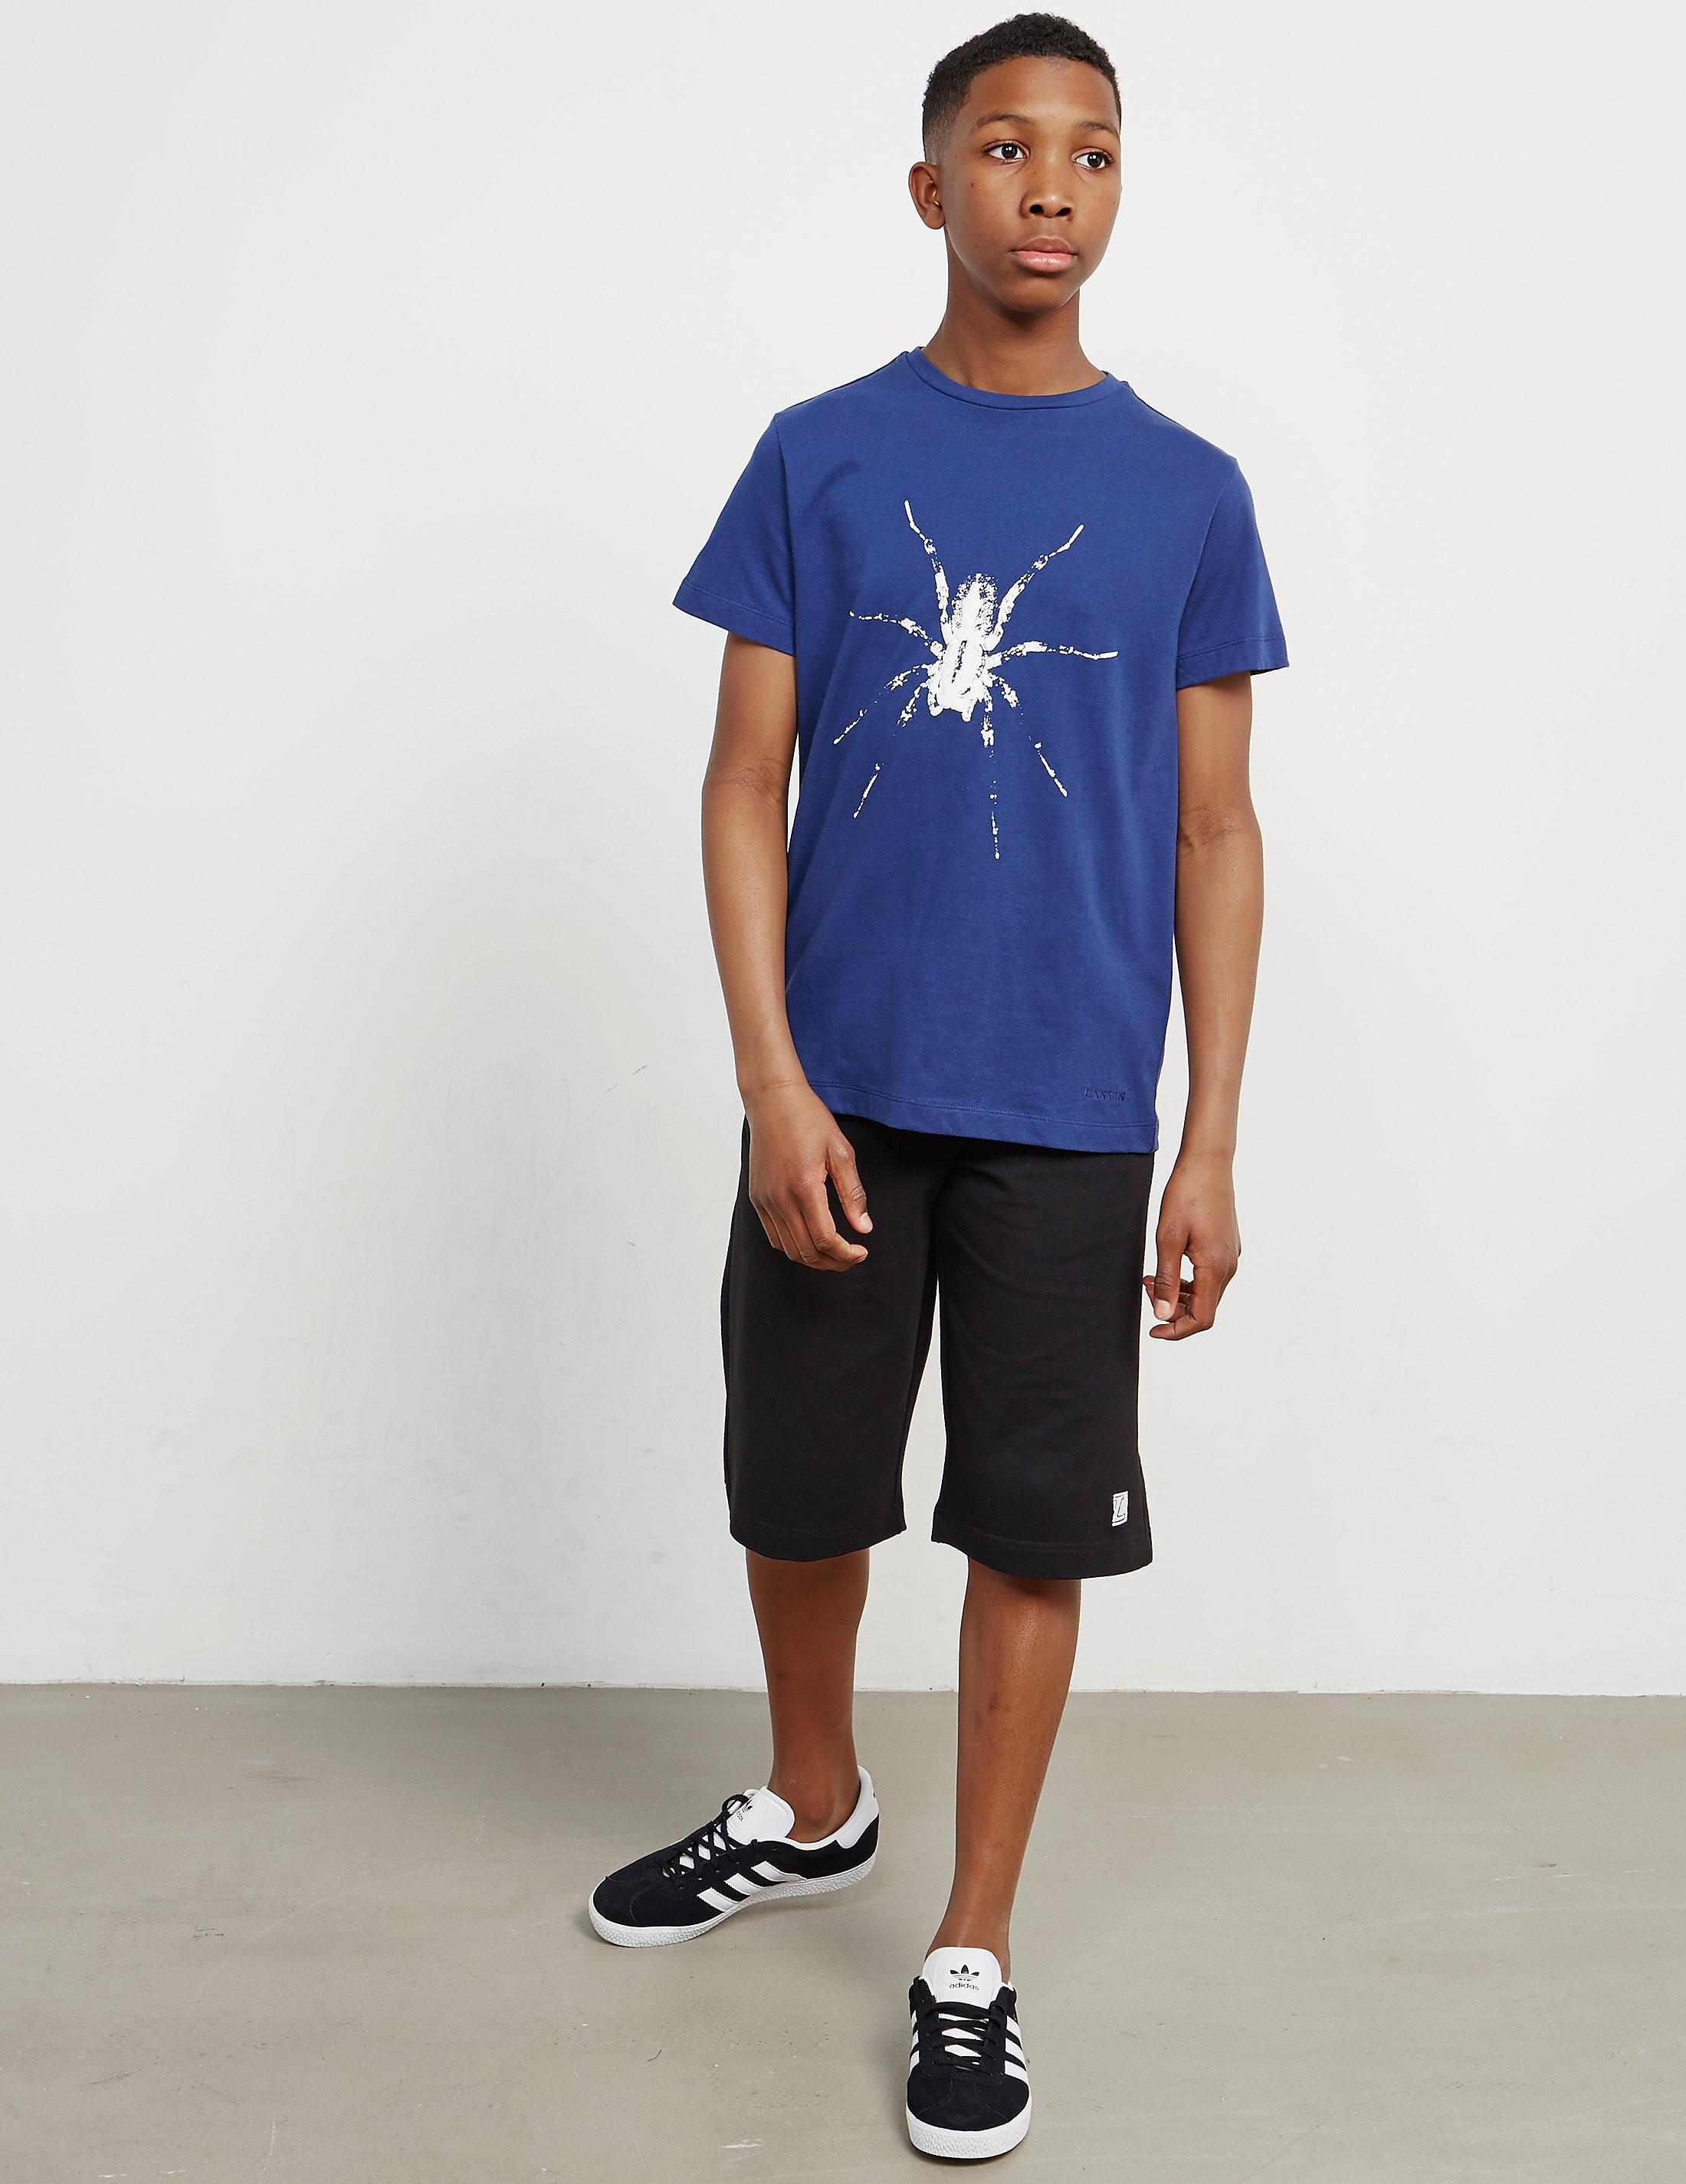 Lanvin Spider Short Sleeve T-Shirt